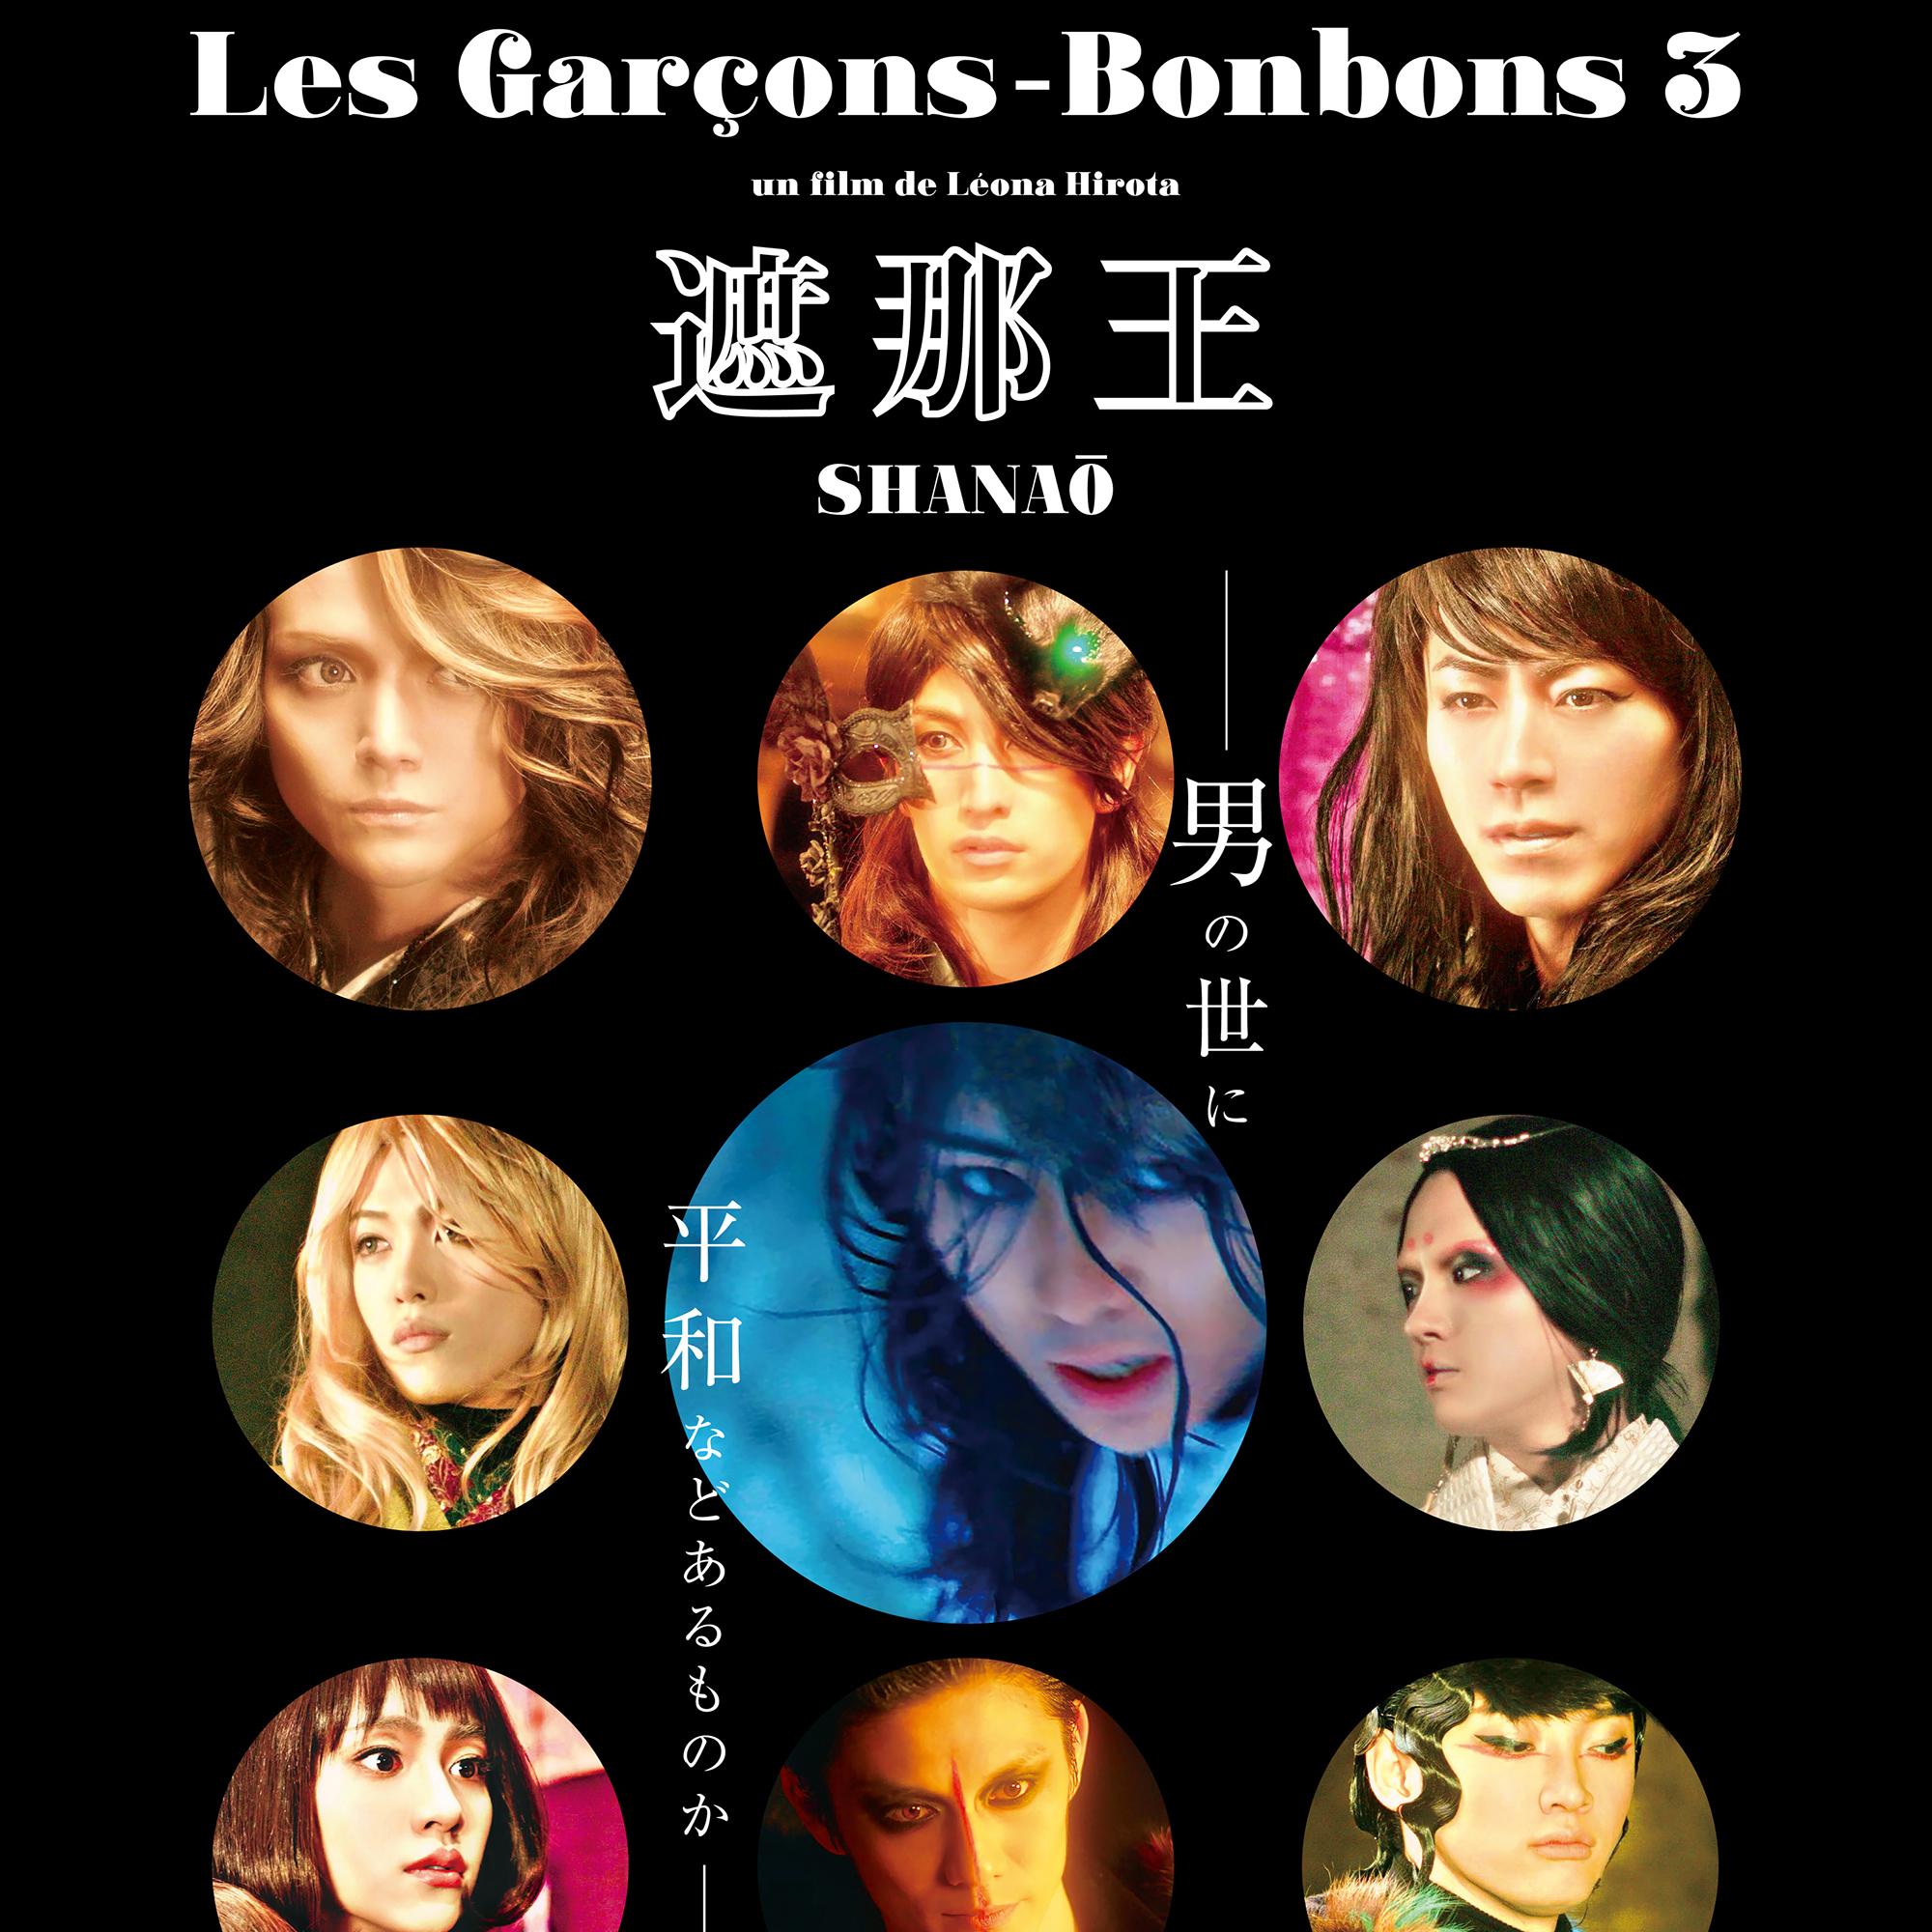 "Léona Hirota ""Shanaō -Les Garcons-Bonbons 3-"""